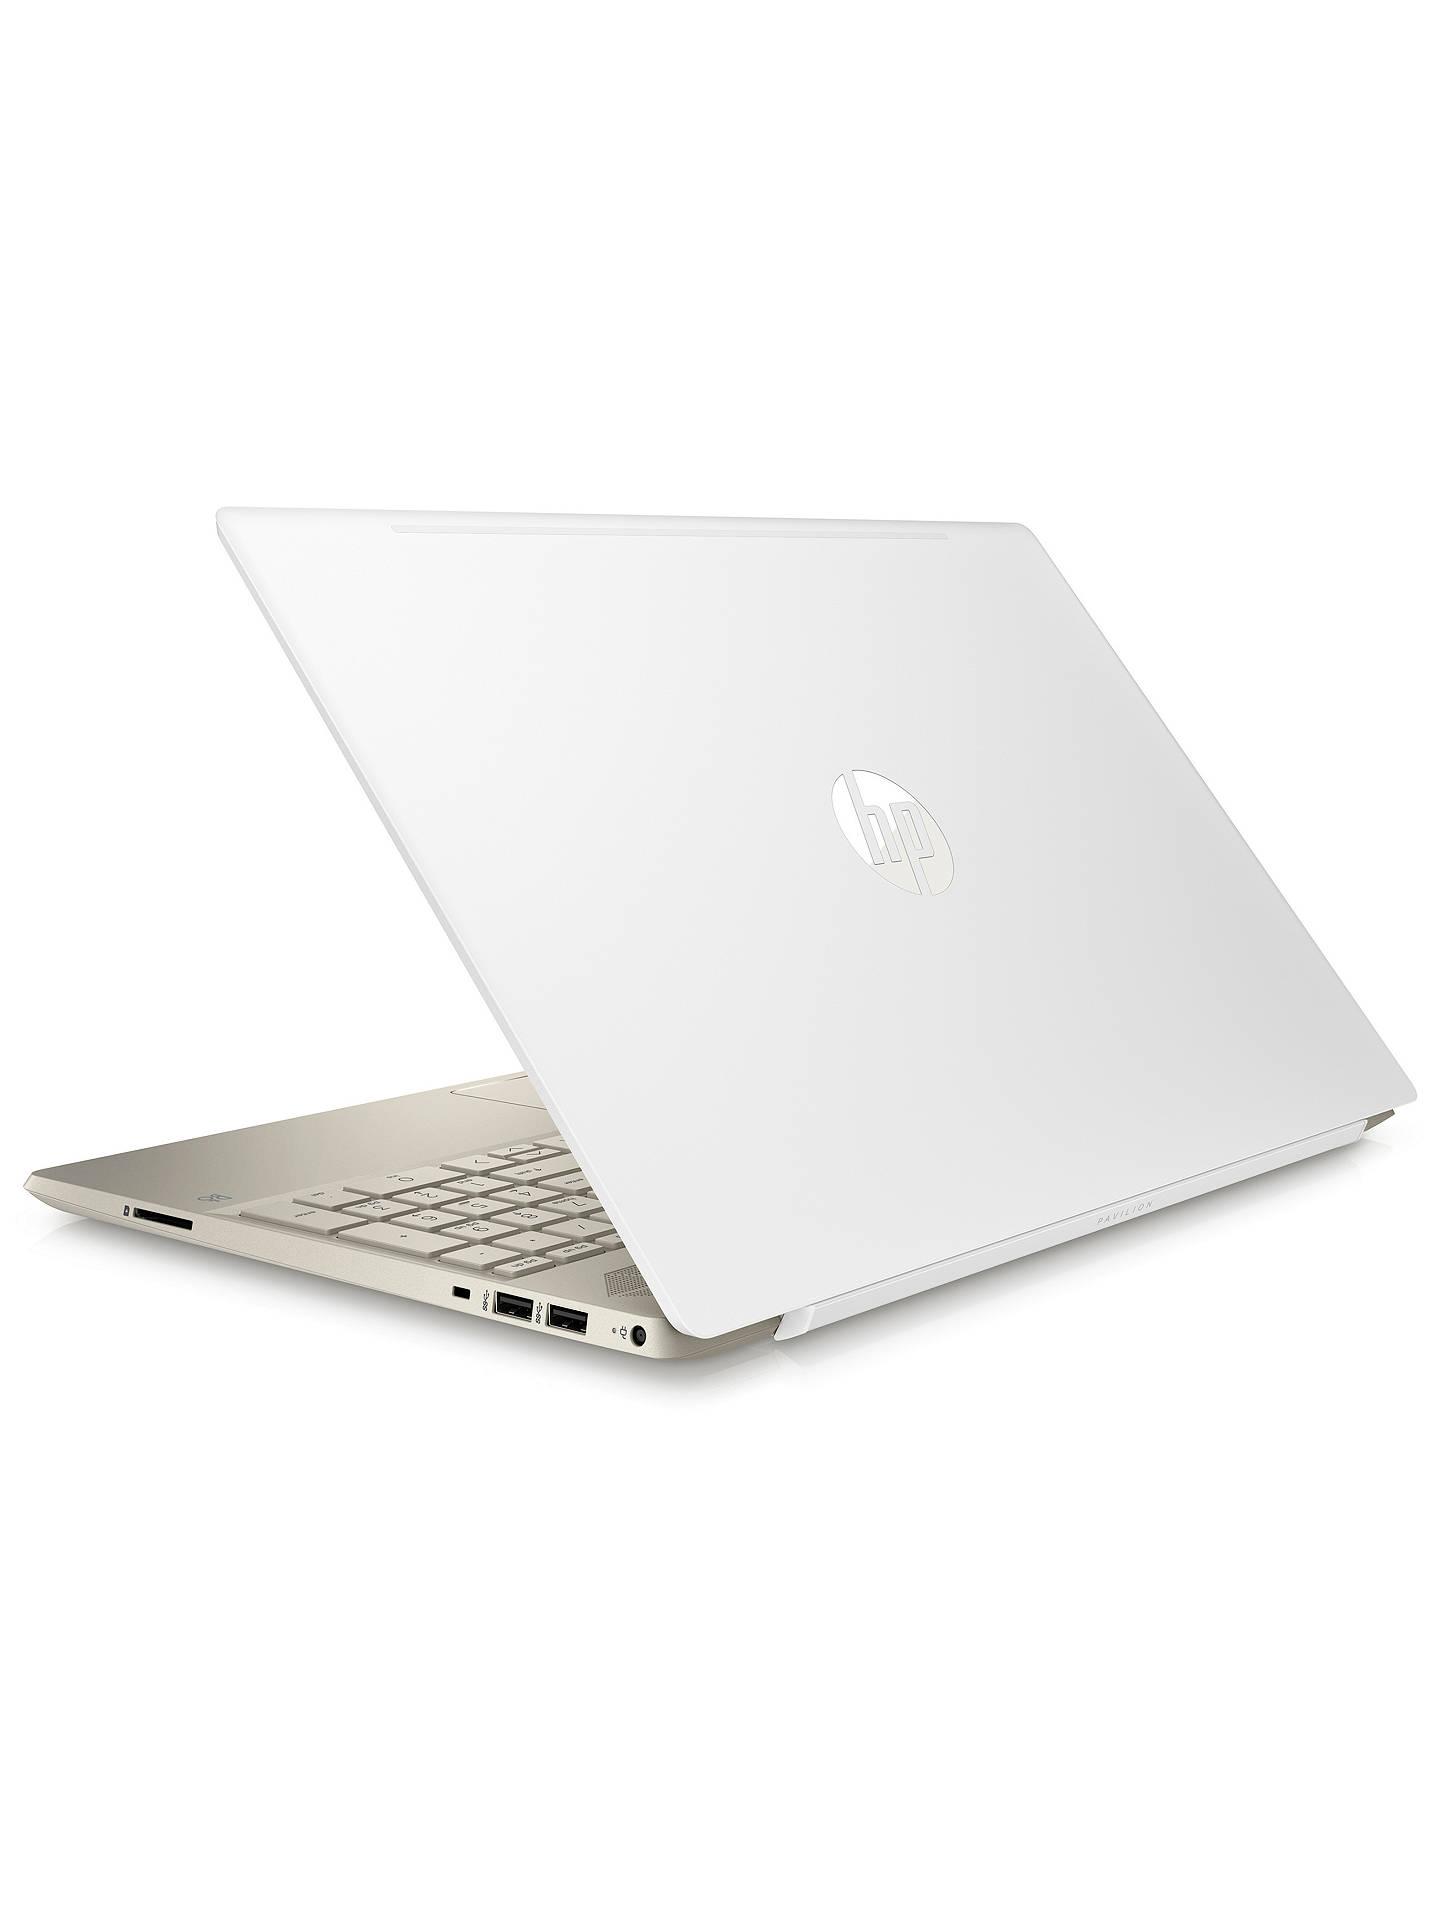 Hp Pavilion 15 Cs0999na Laptop Intel Pentium Gold 4gb Ram 128gb Ssd 15 6 White Cover At John Lewis Partners